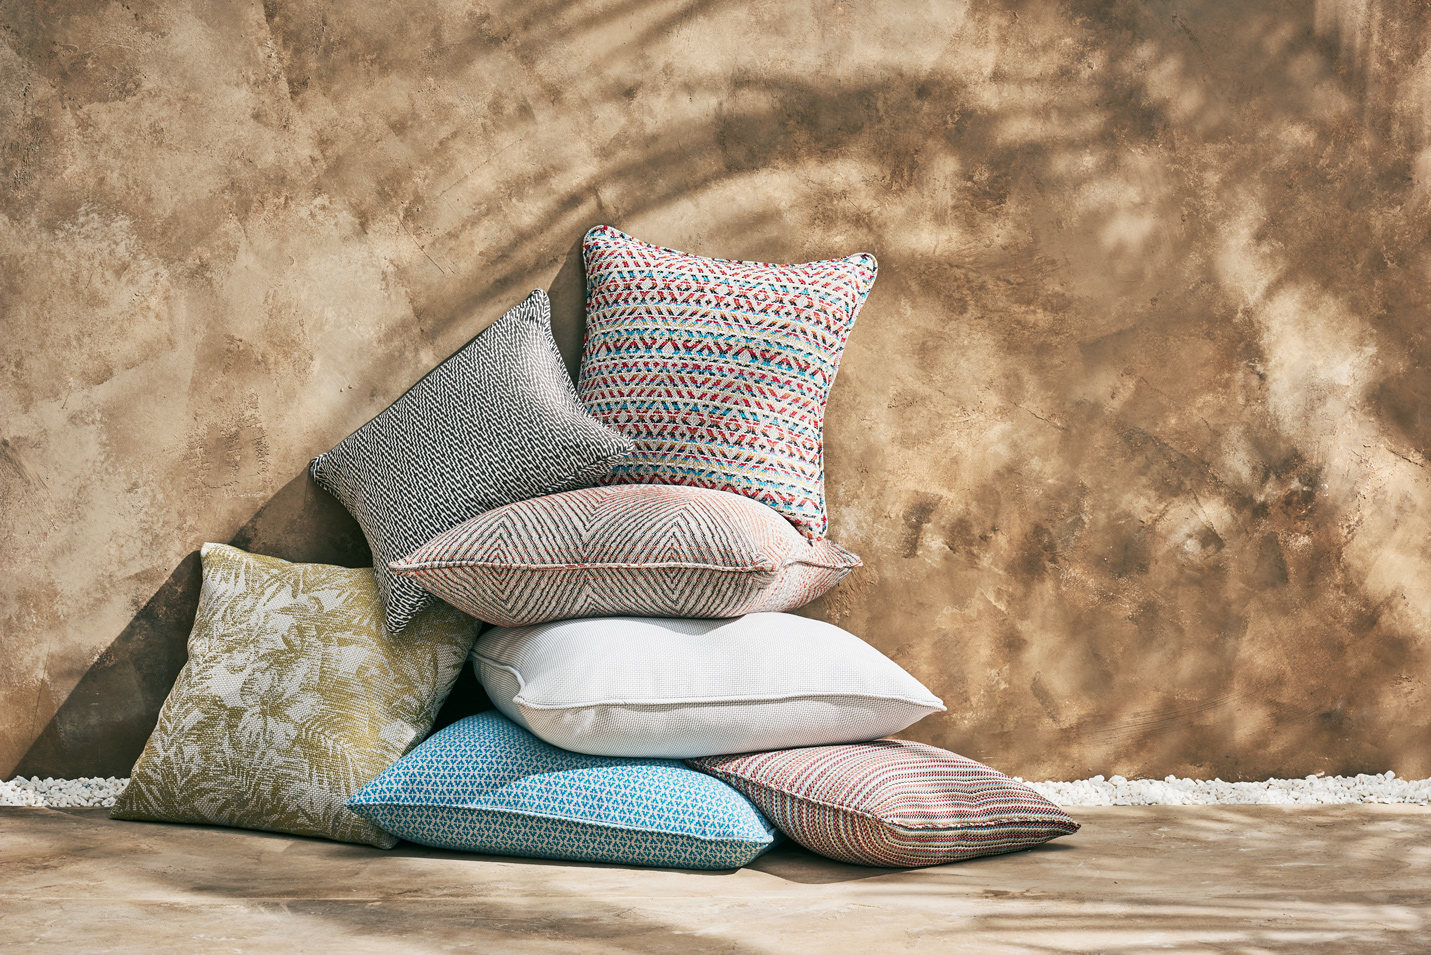 181120_Romo_Shot-36_OutdoorCollection_Cushions_1100.jpg